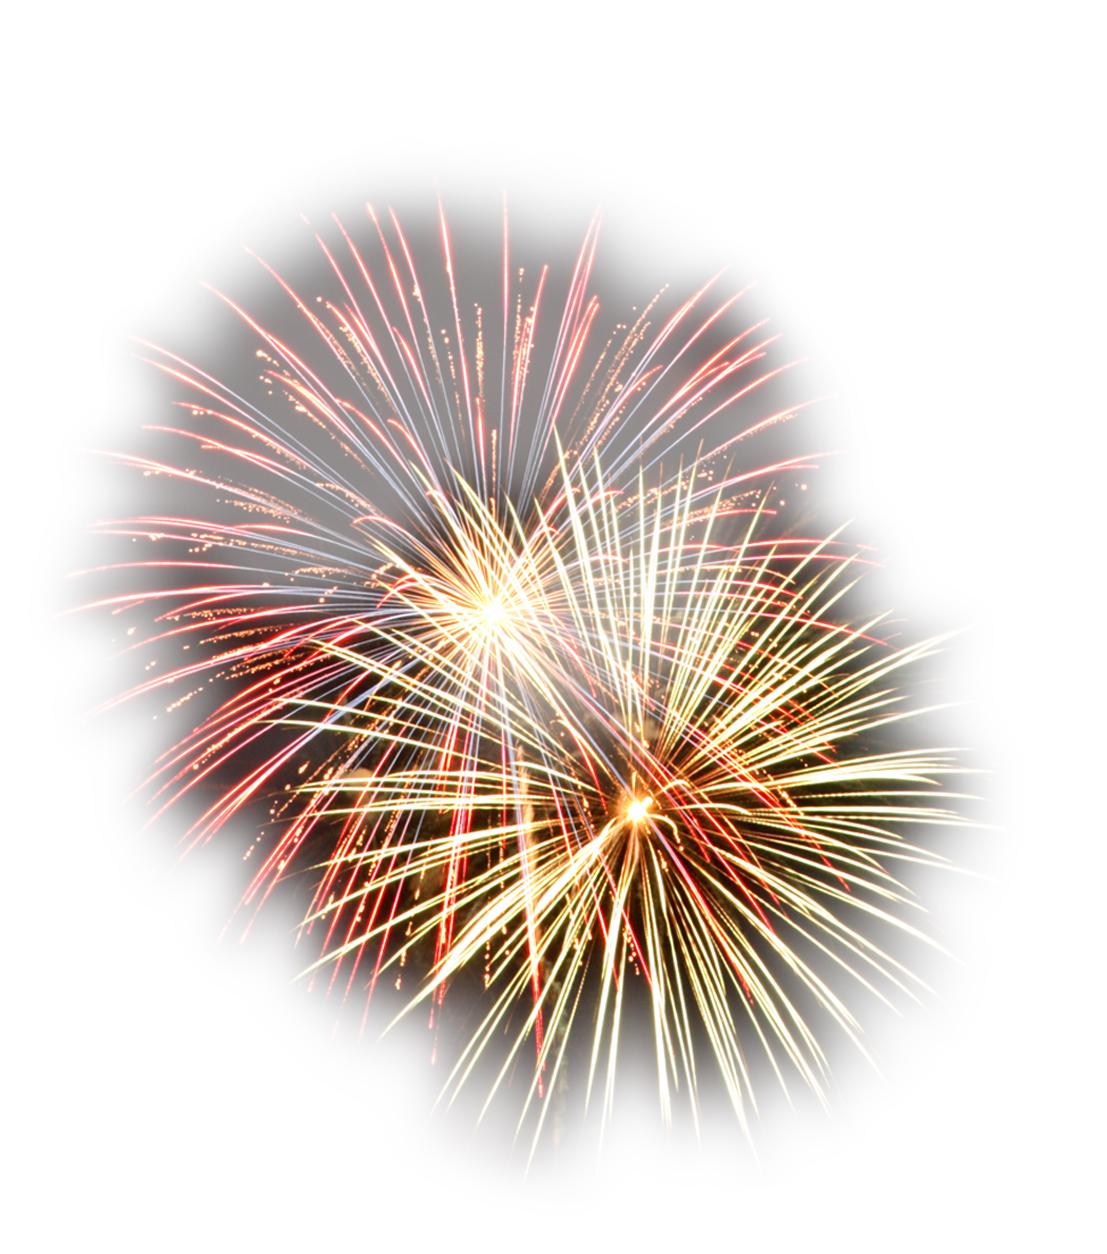 Free png images with transparent backgrounds. Fireworks download pngmart com